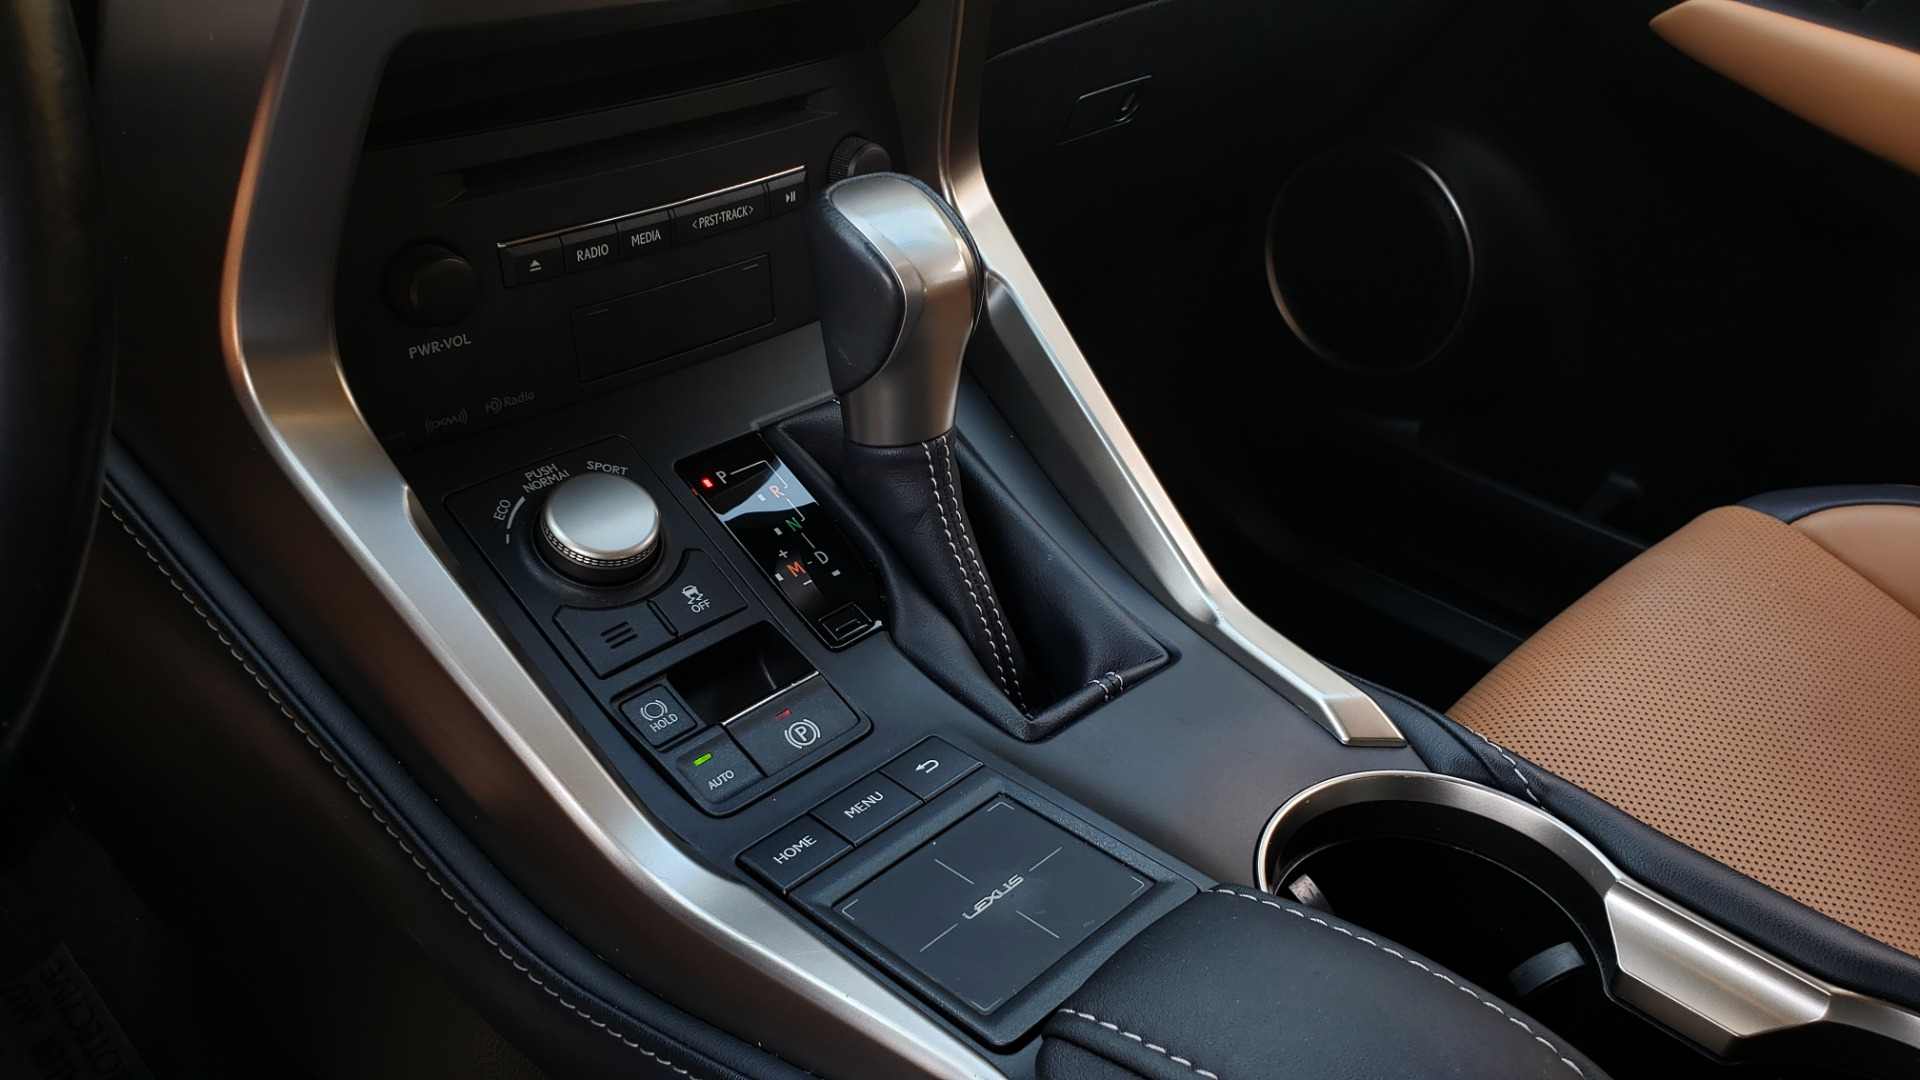 Used 2016 Lexus NX 200T PREM PKG / NAV / SUNROOF / PRE-COLLISION / PARK ASST for sale Sold at Formula Imports in Charlotte NC 28227 48